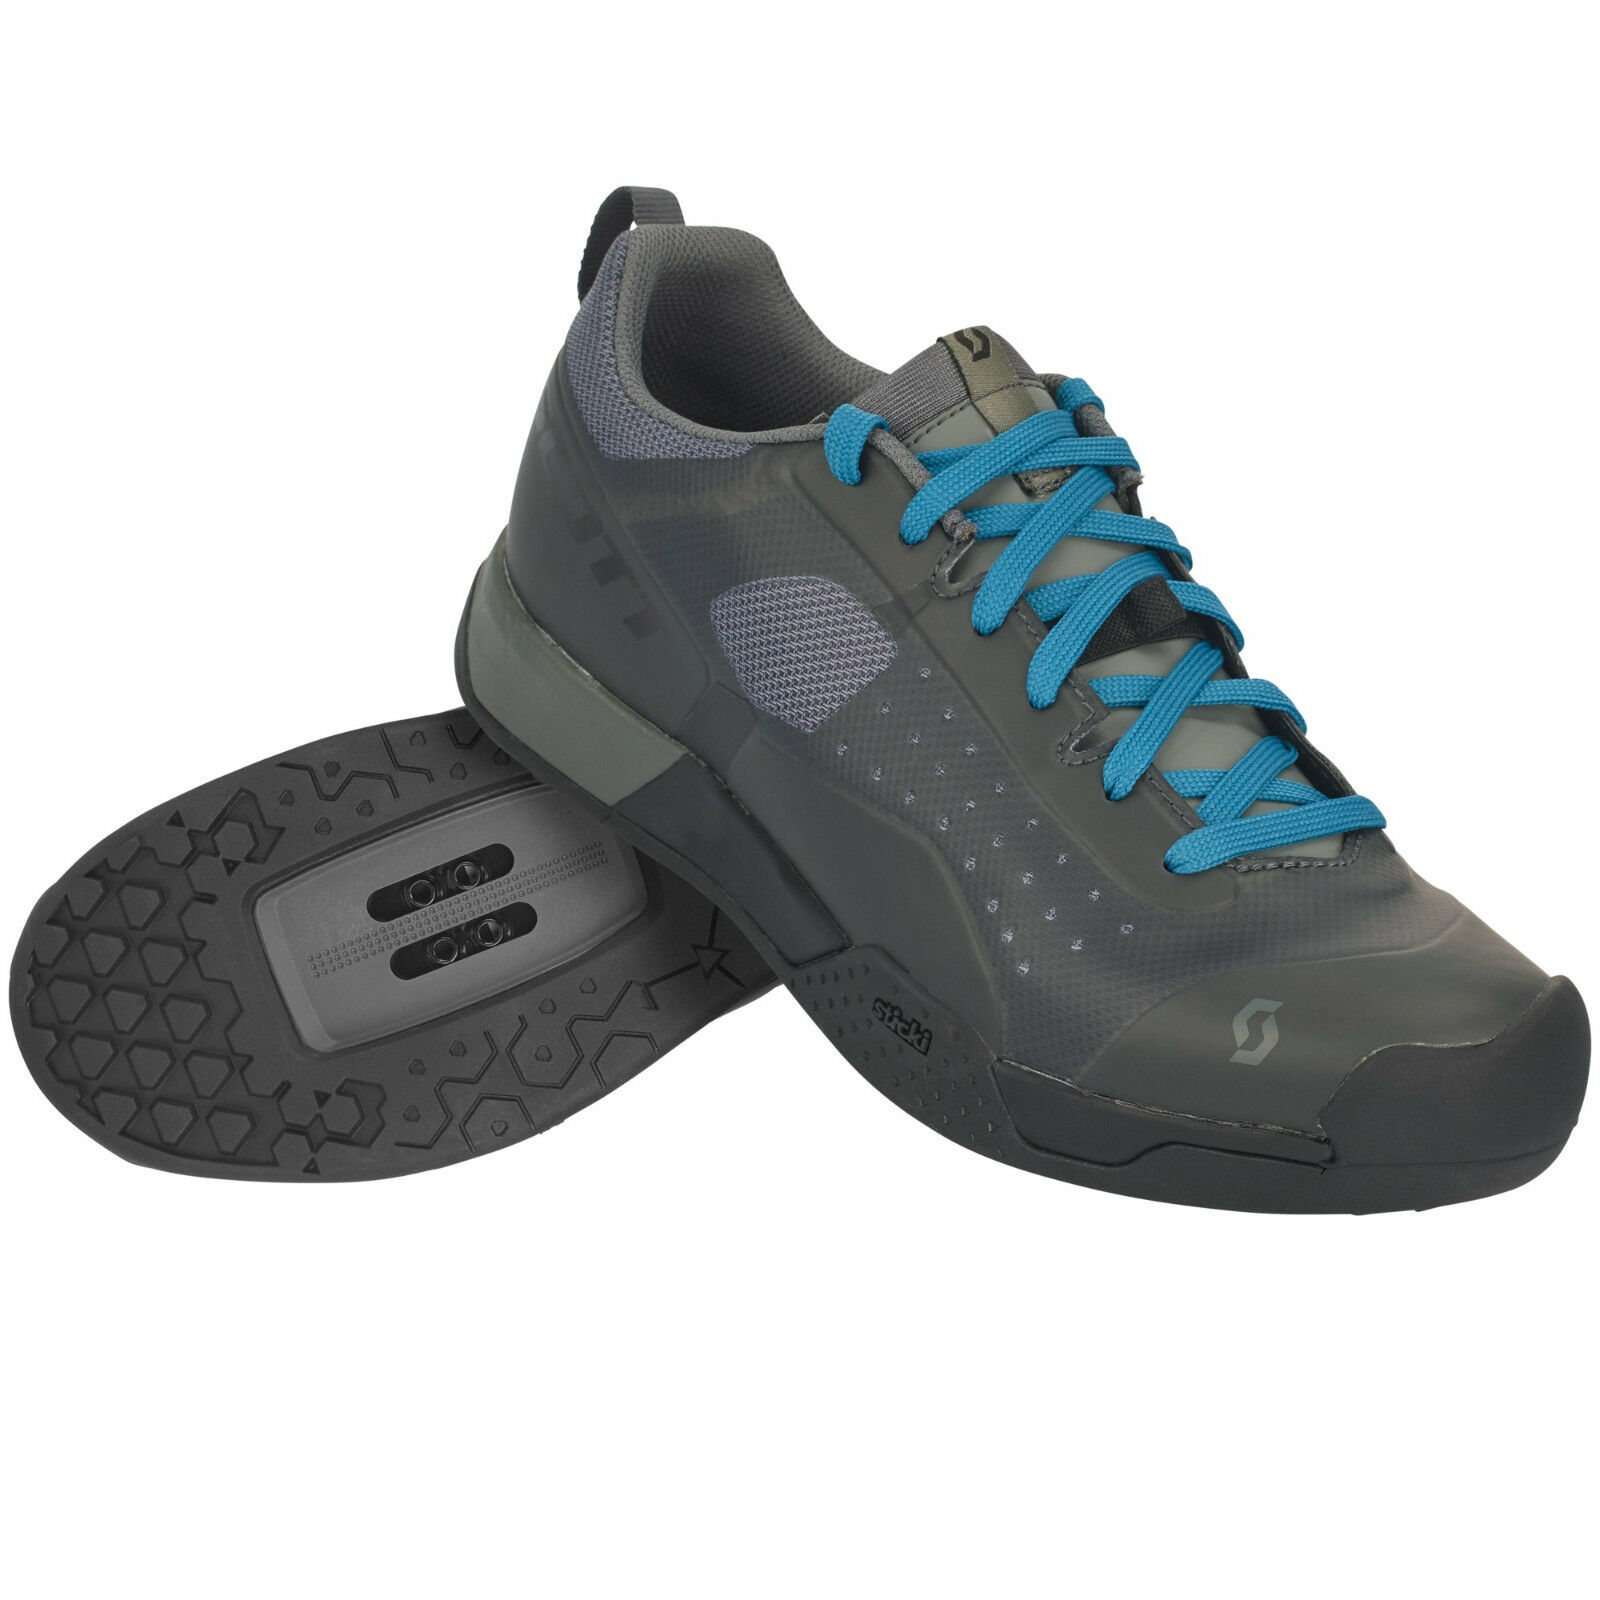 zapatos zapatos SCOTT MTB AR Spitze Spitze Spitze CLIP Color negro-gris 96b263